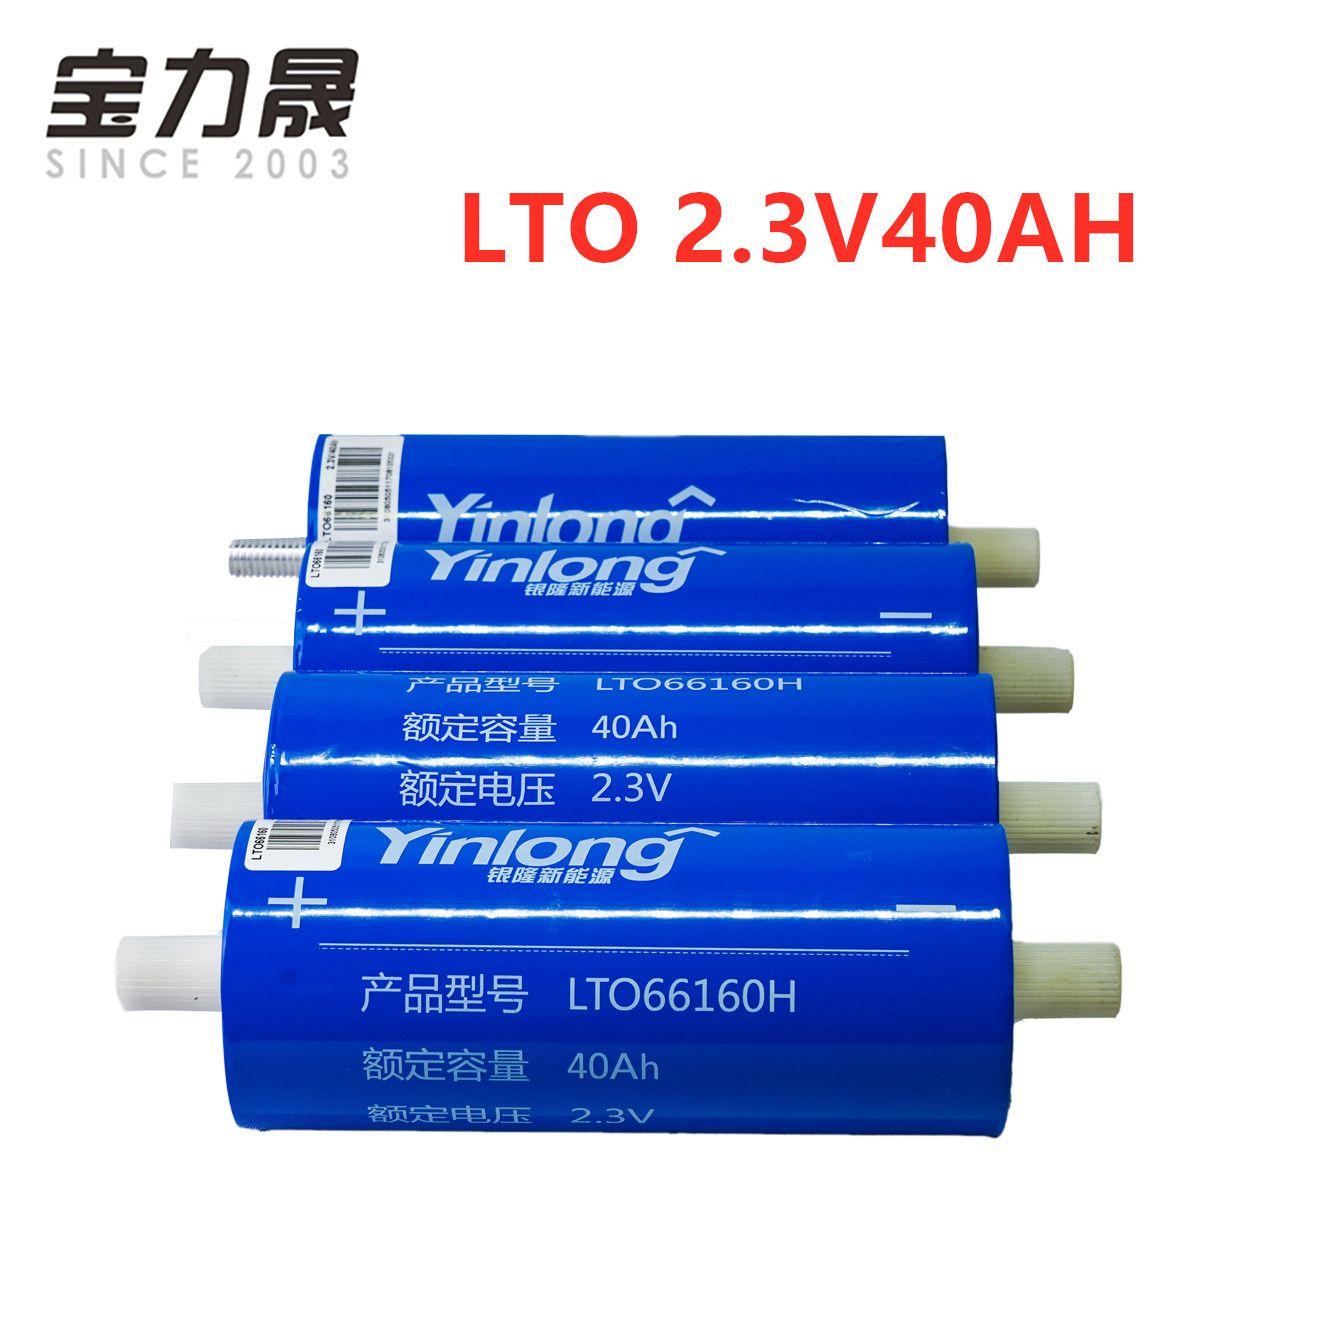 12 stücke 2,3 V 40AH YINLONG LTO 66160 Lithium-titanat-akku Batterie Zelle 2,4 v 10C 400A für 12v 14,4 v Power Lange Lebensdauer EV golf warenkorb